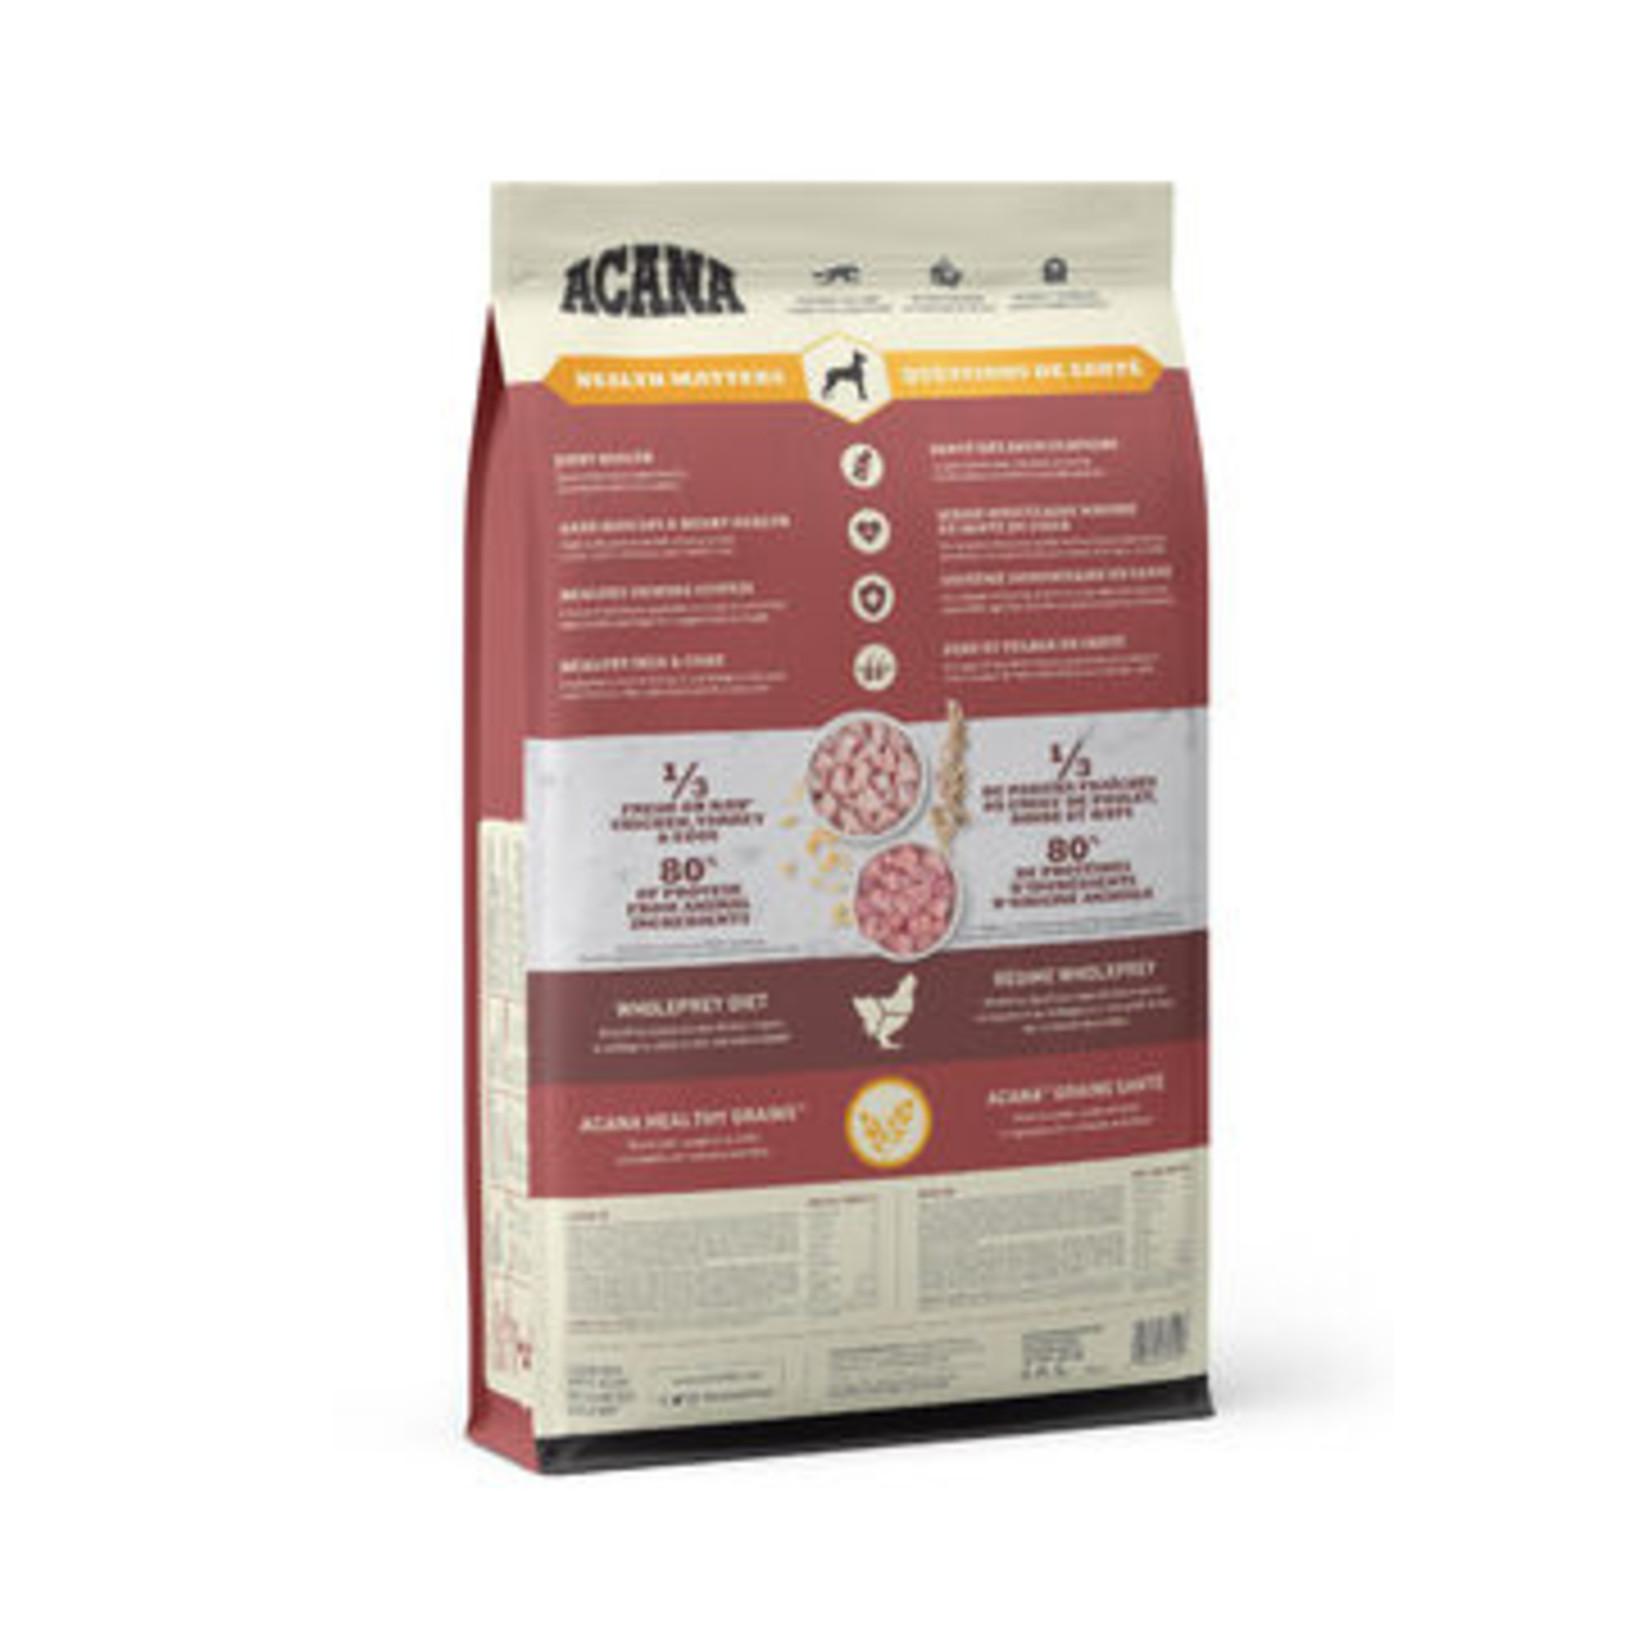 ACANA Acana Healthy Grains Adult Large breed